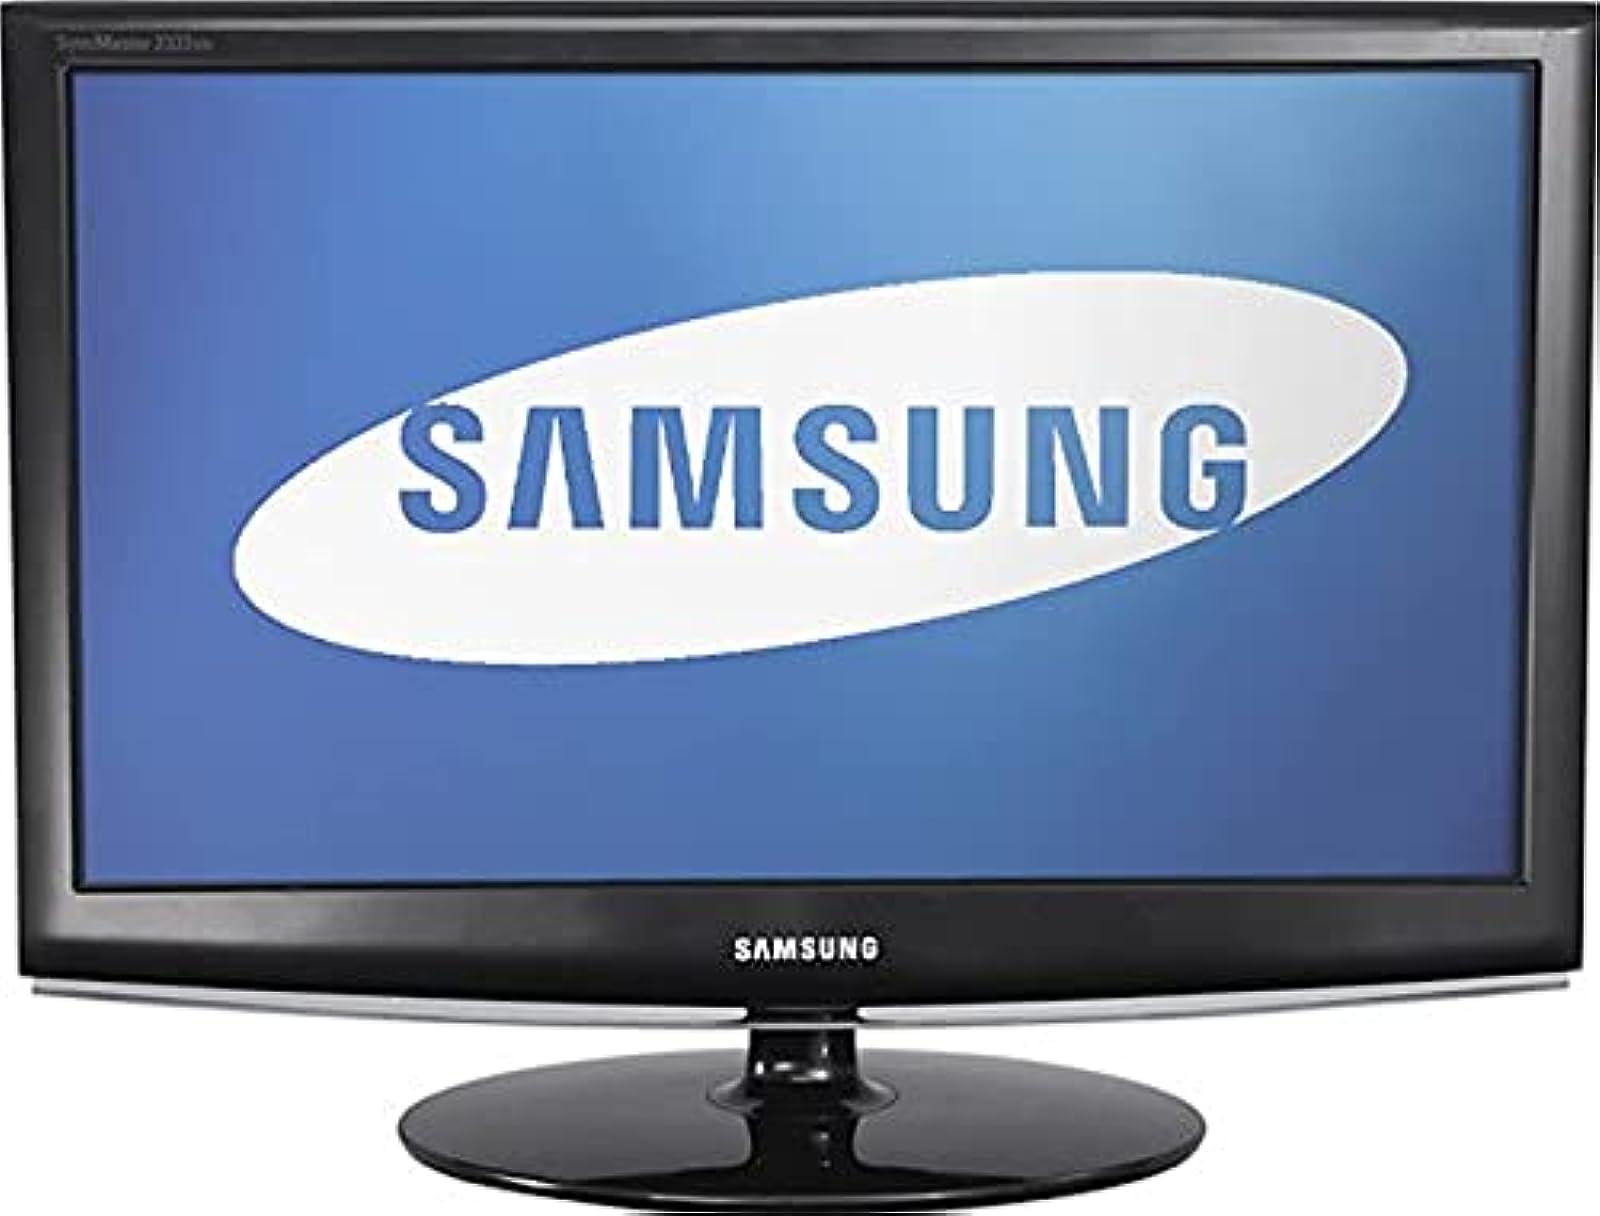 Samsung 2333T 23 Inch Class Widescreen LCD Monitor Black